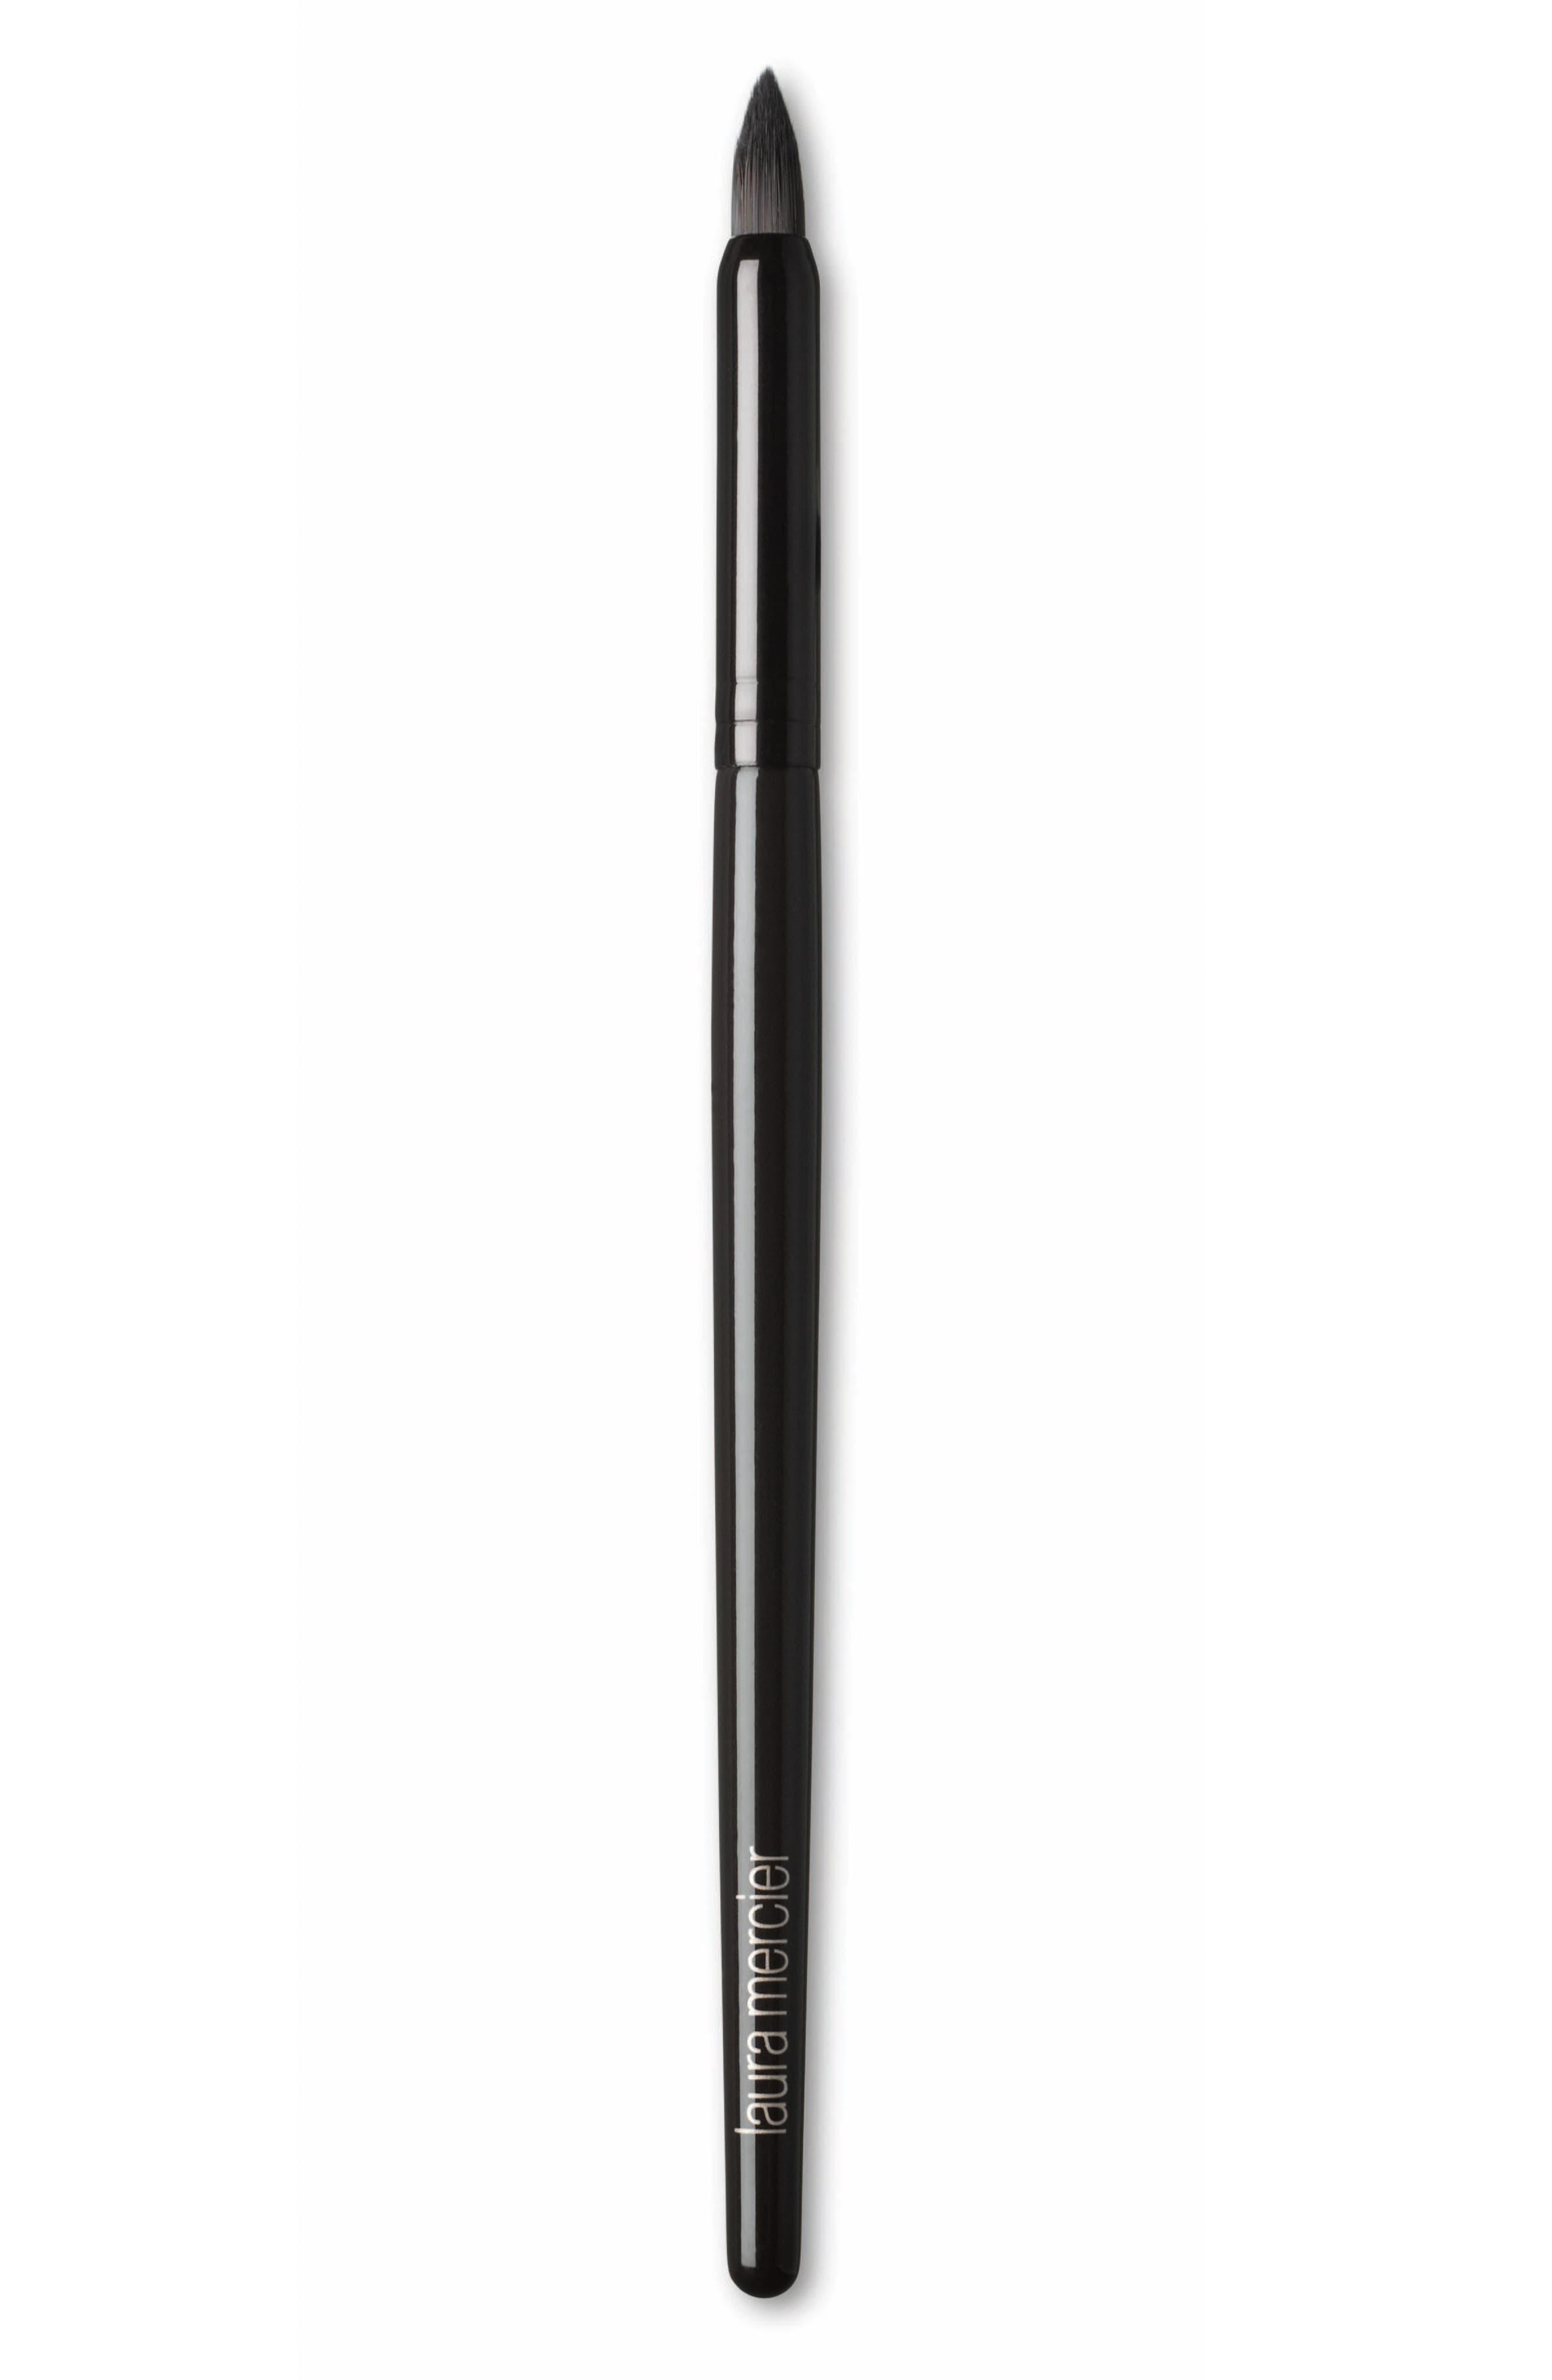 Smoky Eyeliner Brush,                         Main,                         color, No Color